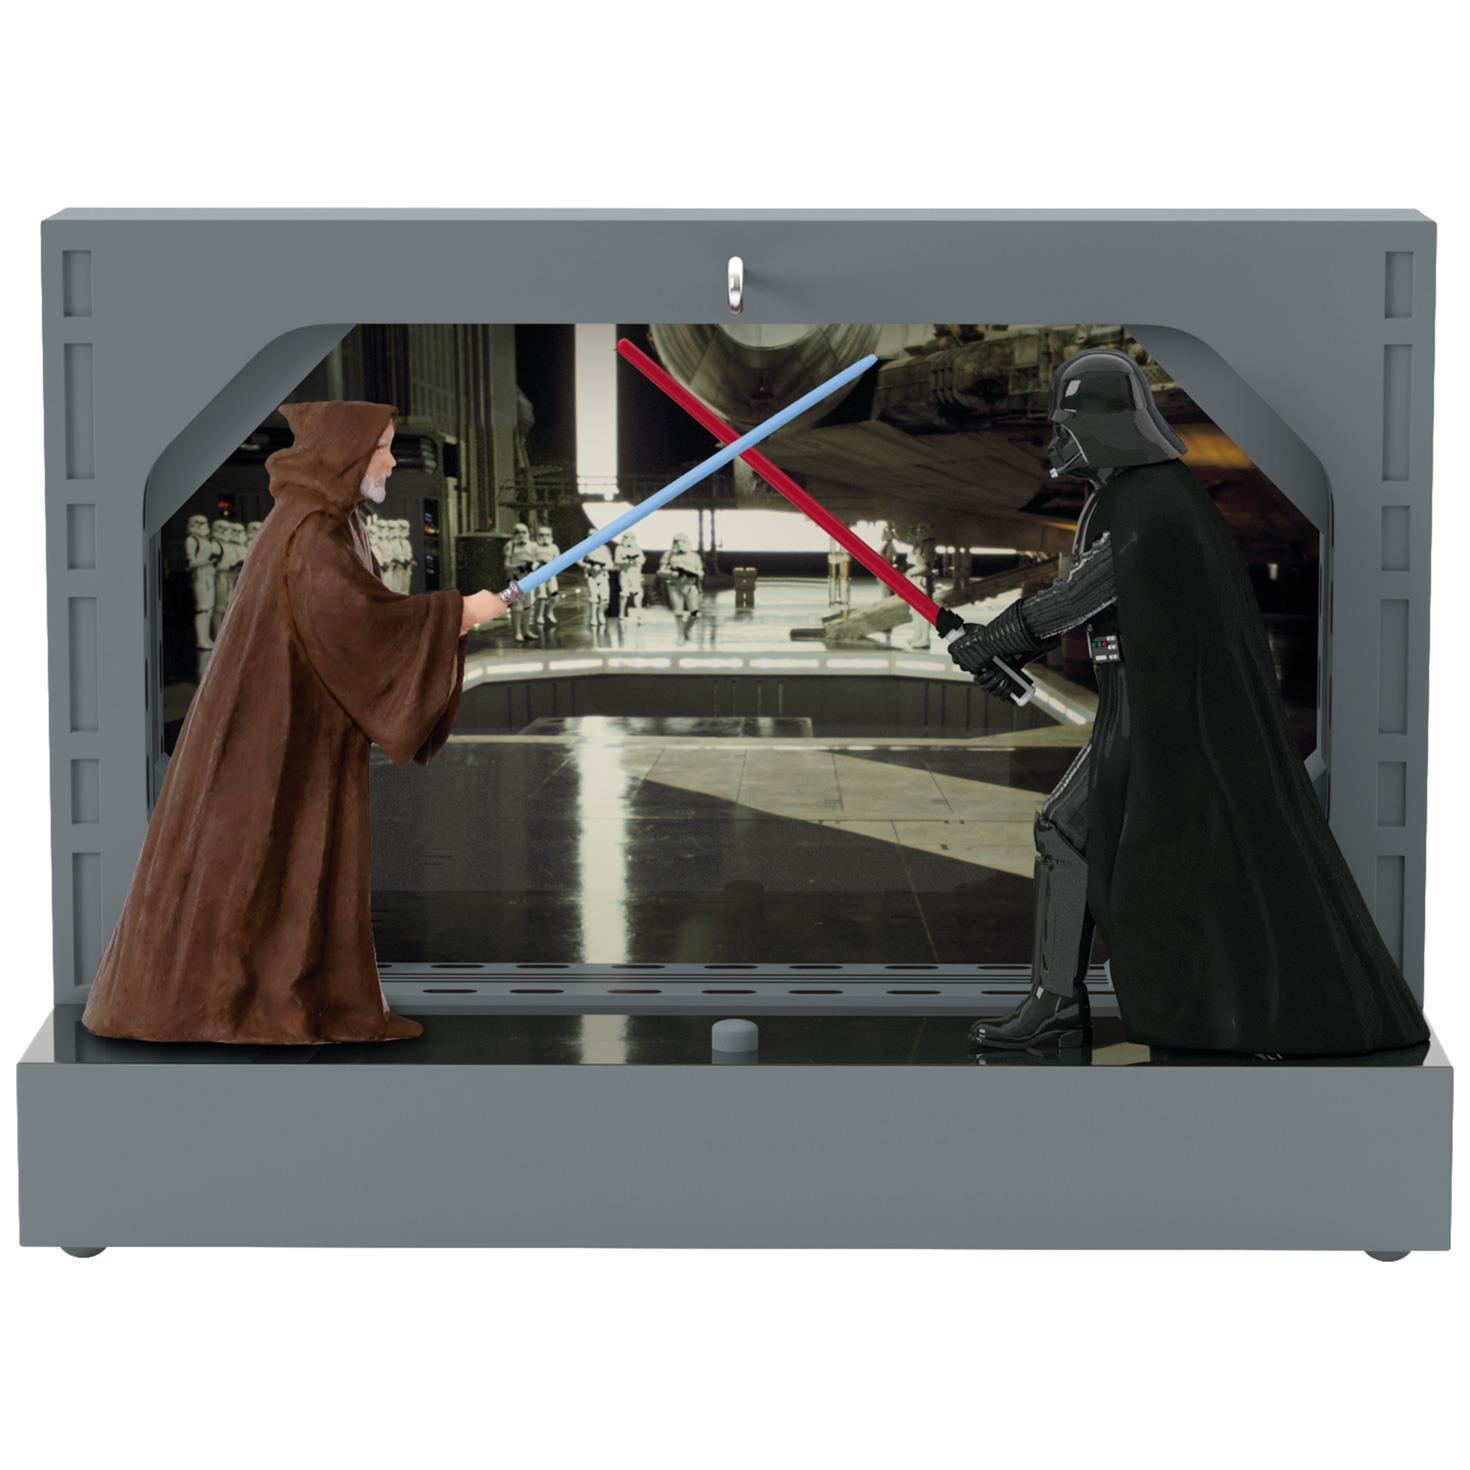 Star Wars™: A New Hope™ A Duel To The Death Sound Ornament  Keepsake  Ornaments  Hallmark